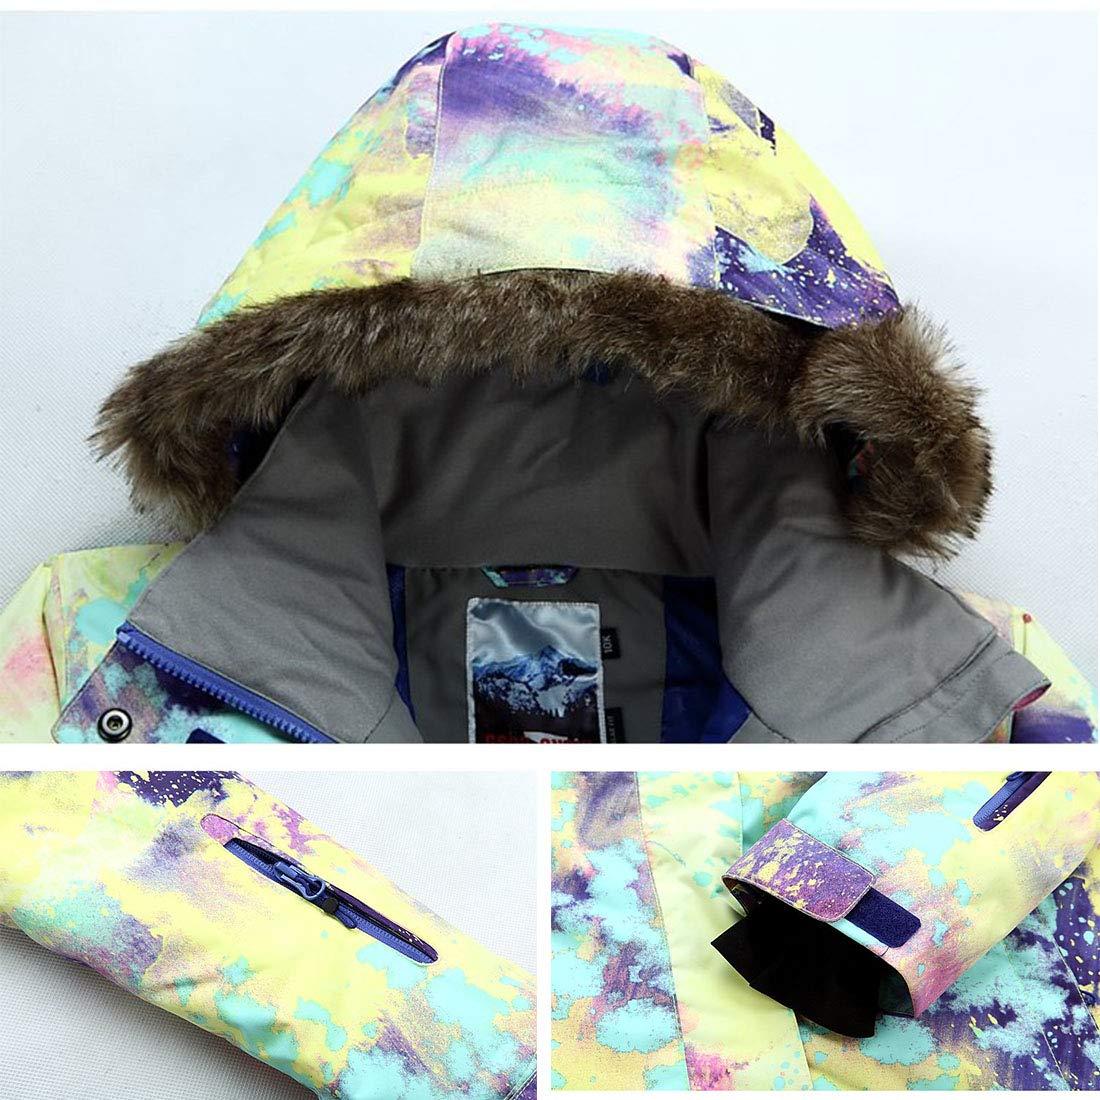 APTRO Womens High-Tech Fashion Ski Jacket Mountain Snowboard Rain Jacket